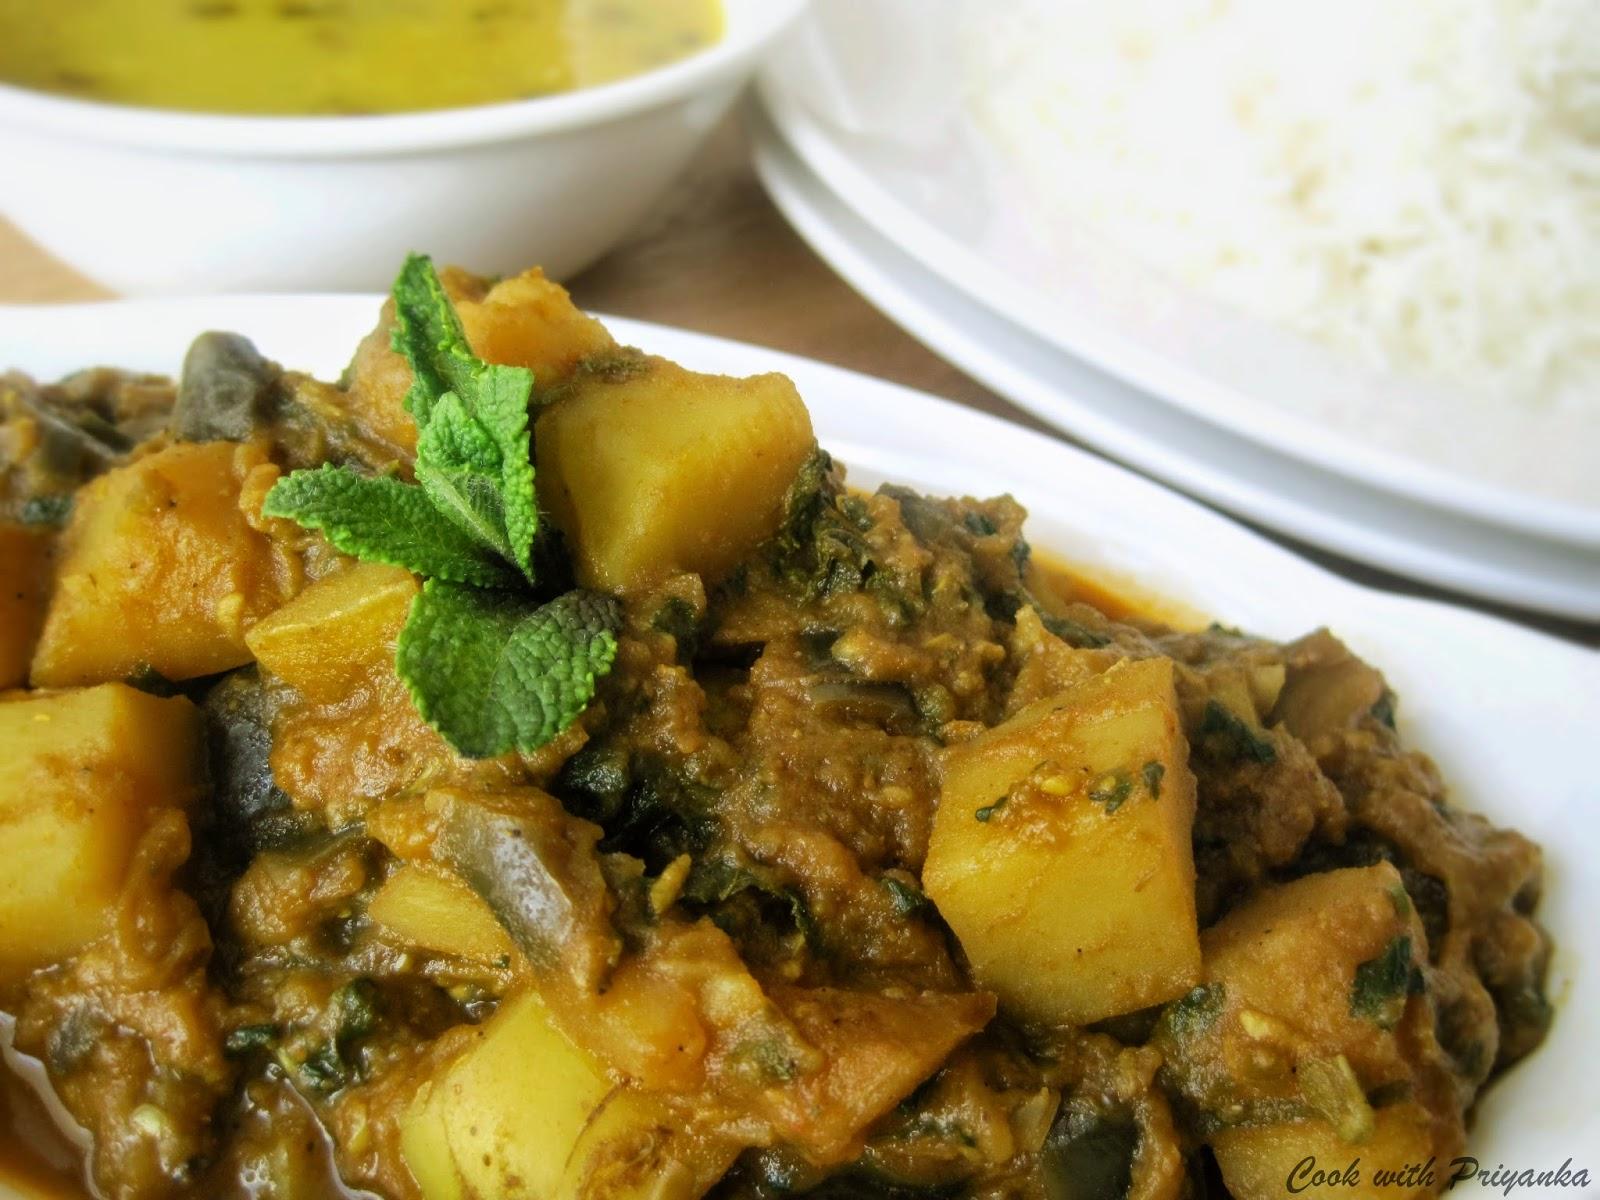 http://cookwithpriyankavarma.blogspot.co.uk/2014/04/mommys-lehsuni-aloo-baigan-aubergines.html